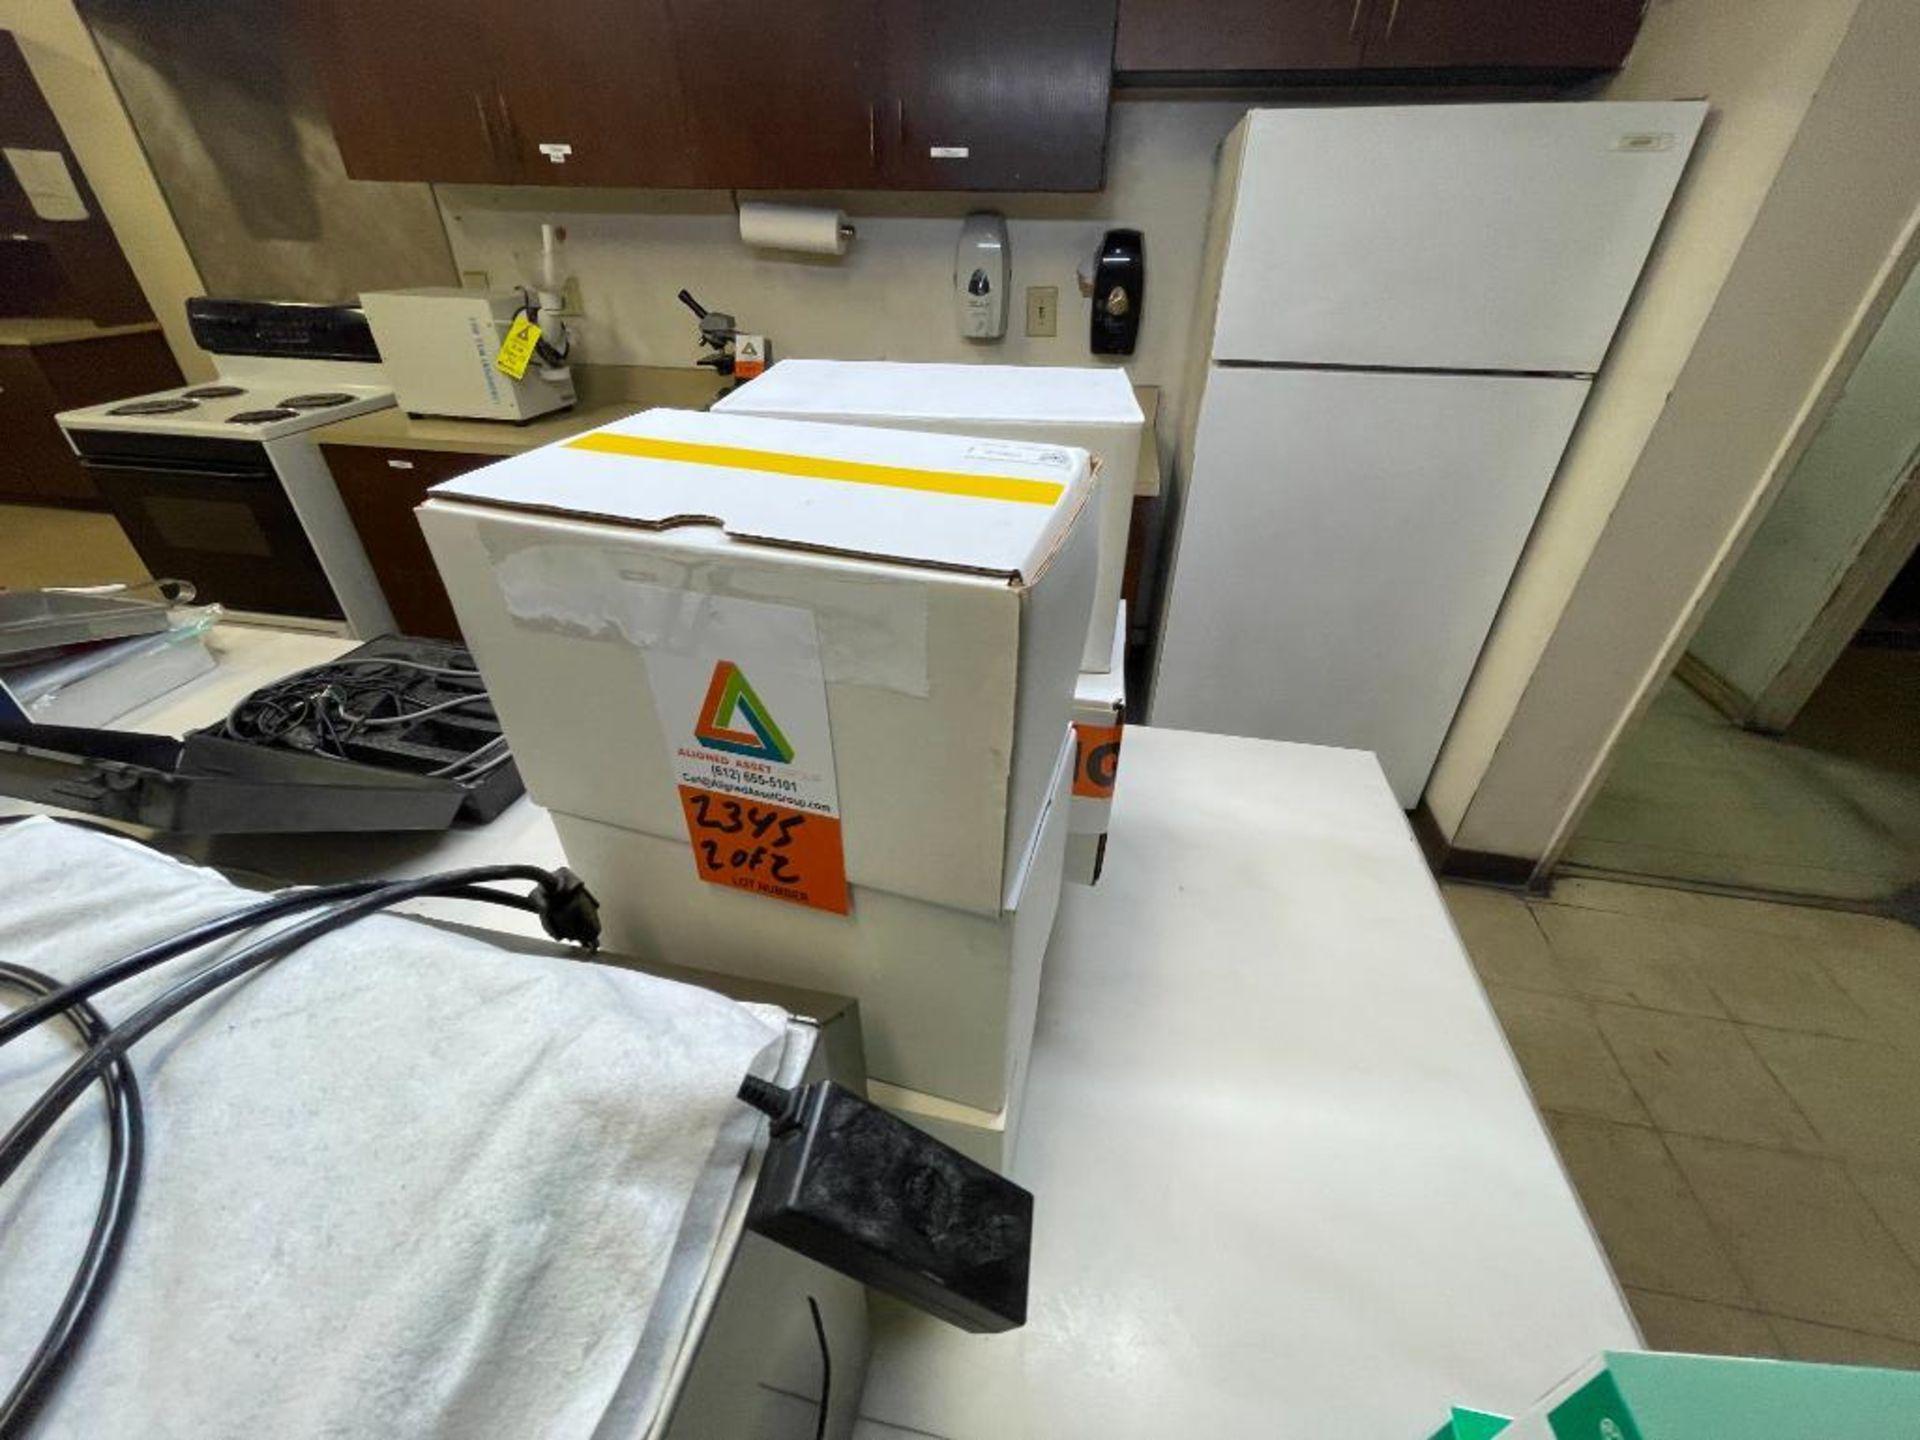 Labeltac barcode printer - Image 5 of 9